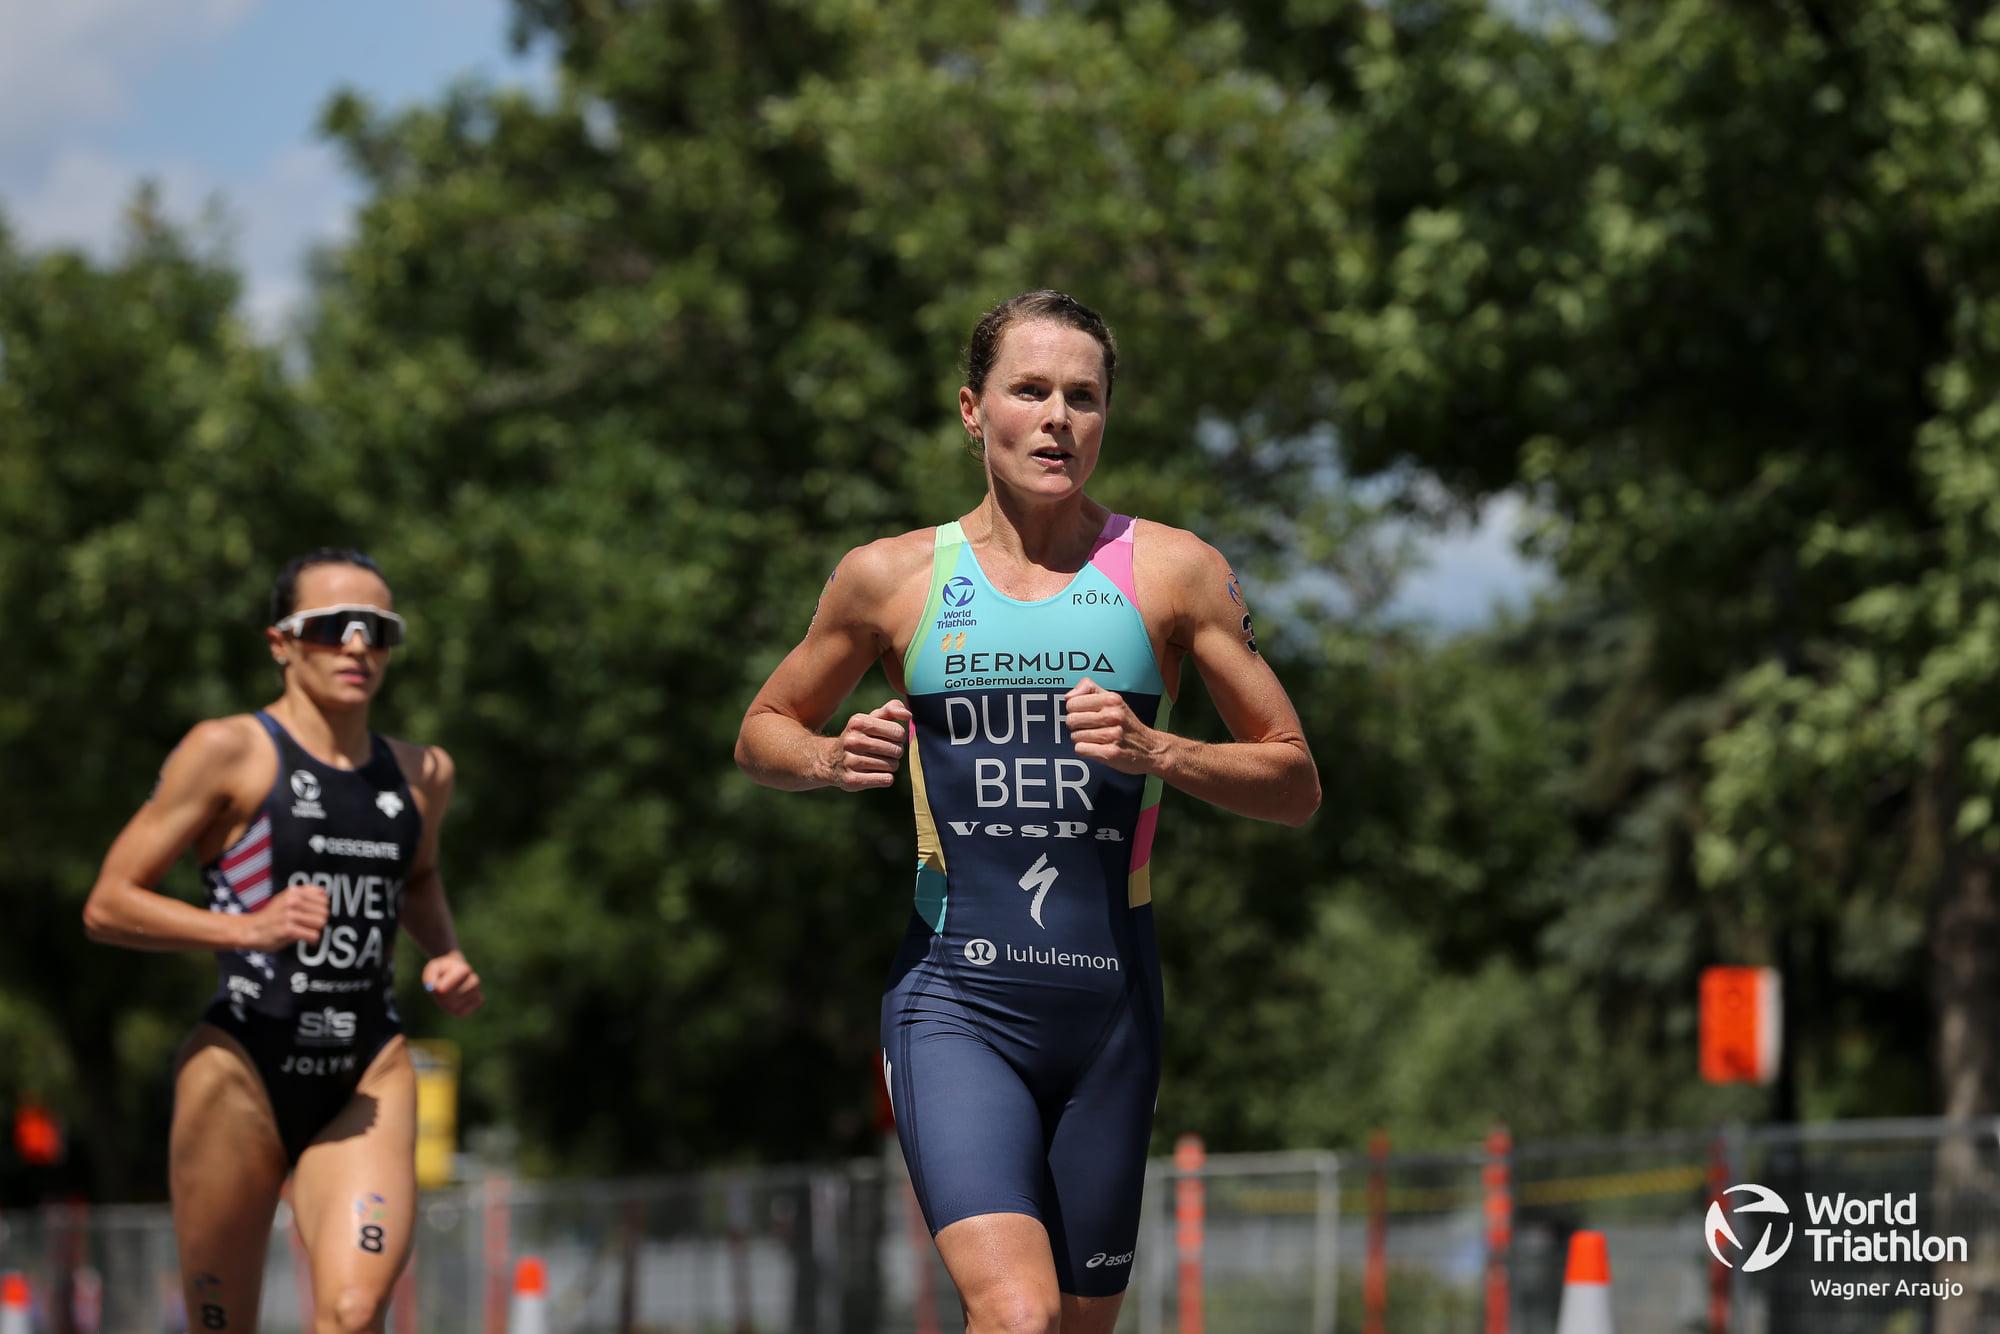 Bermudian tri Flora Duffy Montreal race Augist 2021 (4)